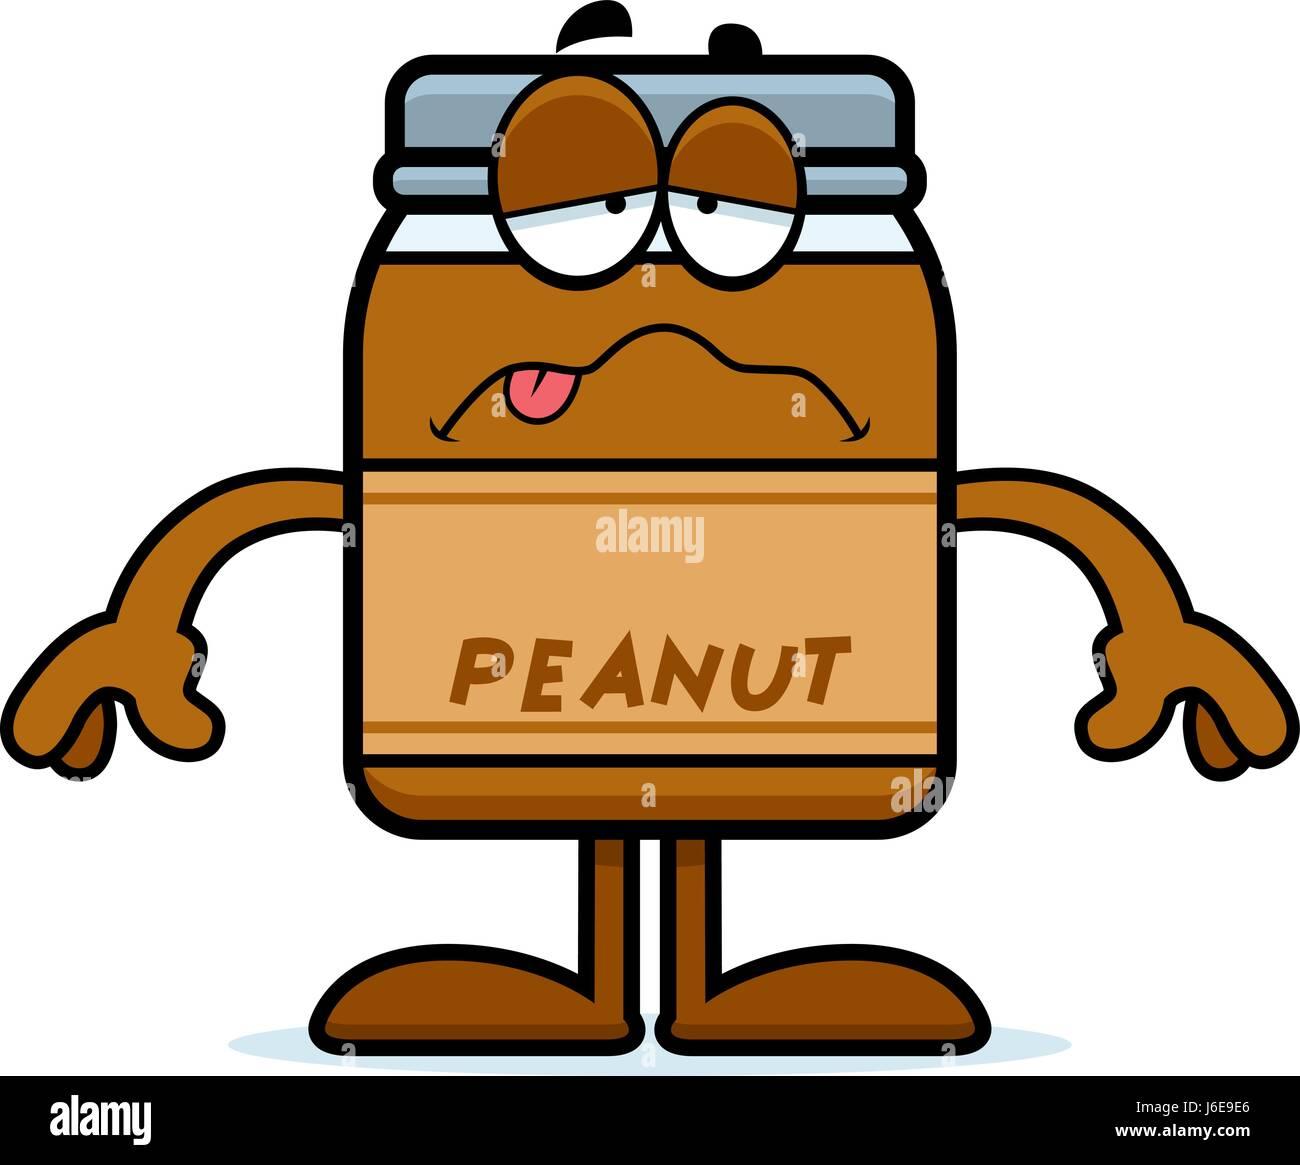 Peanut butter jar doodle icon cartoon Royalty Free Vector